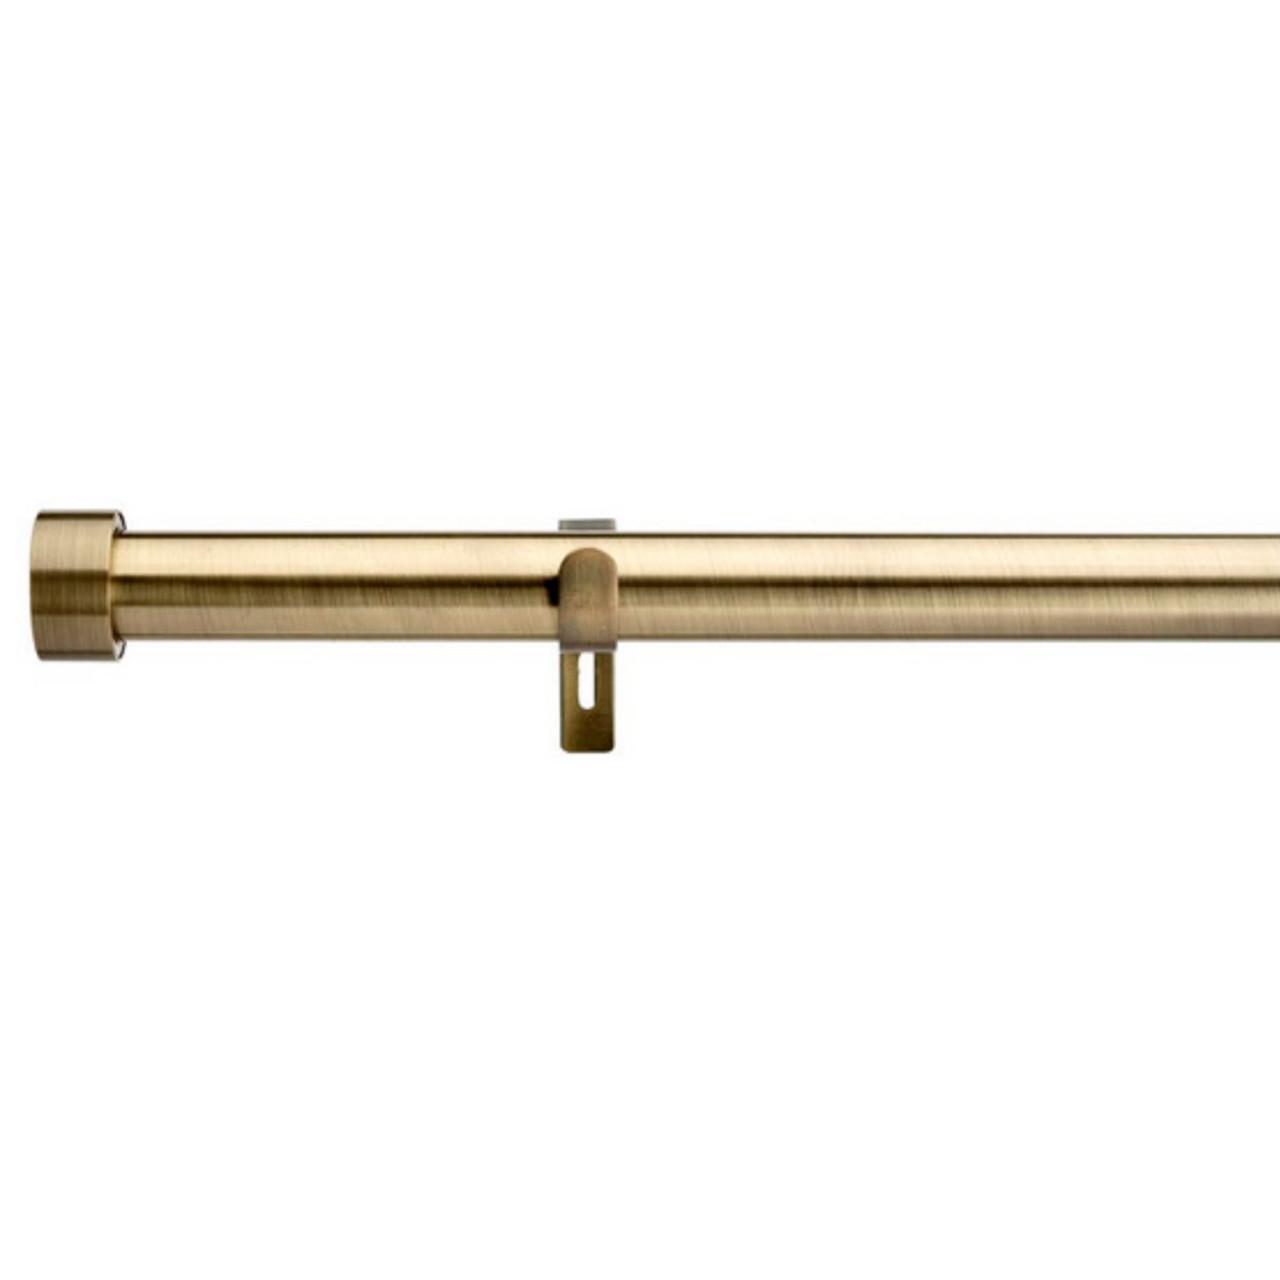 Curtain Rod Extendable Set 80cm To 300cm Contemporary Brass Quickfit